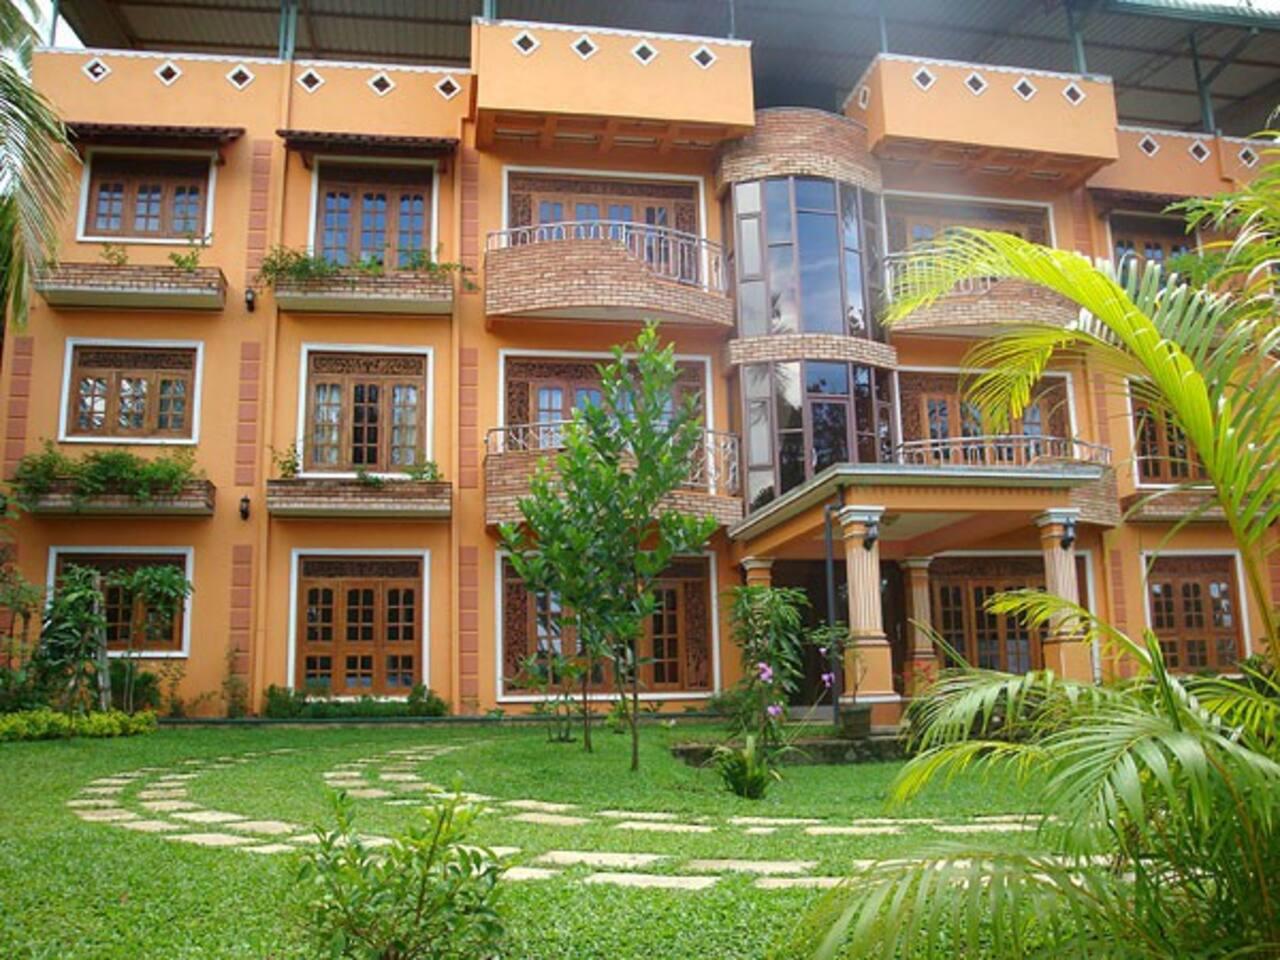 Apartment in Dickwella, Sri Lanka